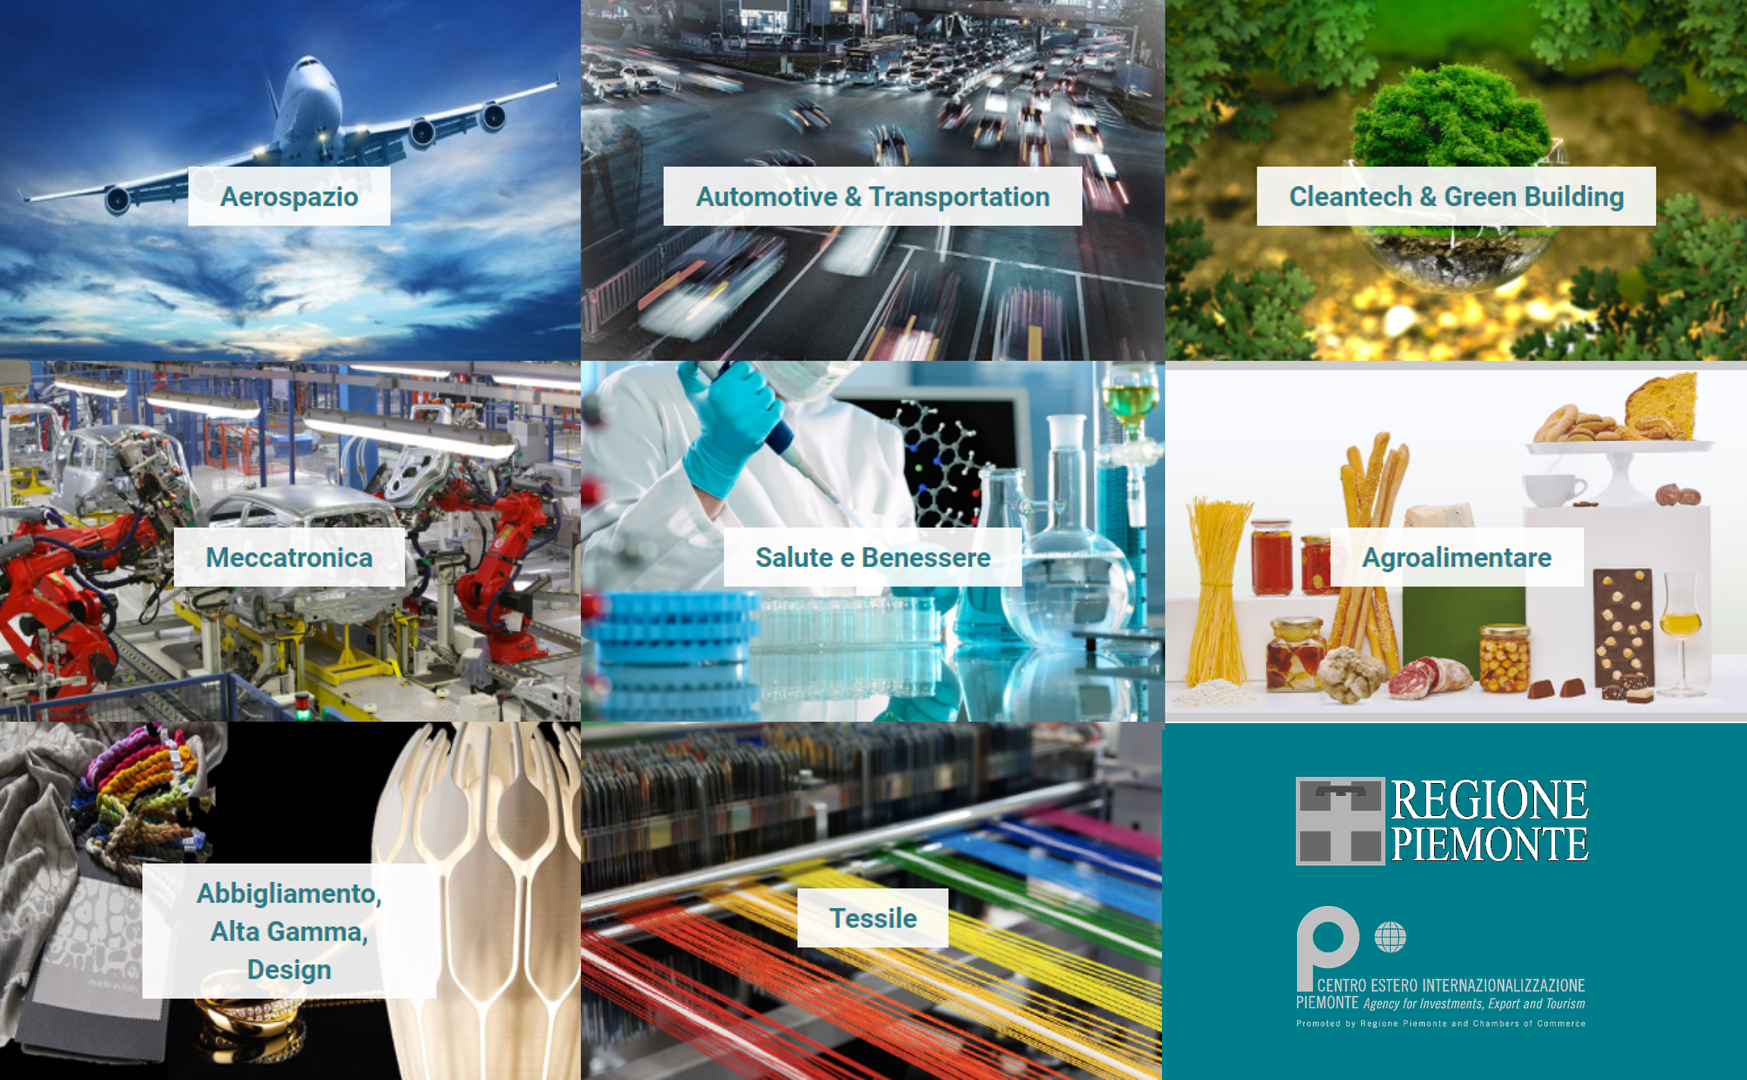 Webinar PIF 2020-21: Automotive & Transportation, Aerospazio, Meccatronica